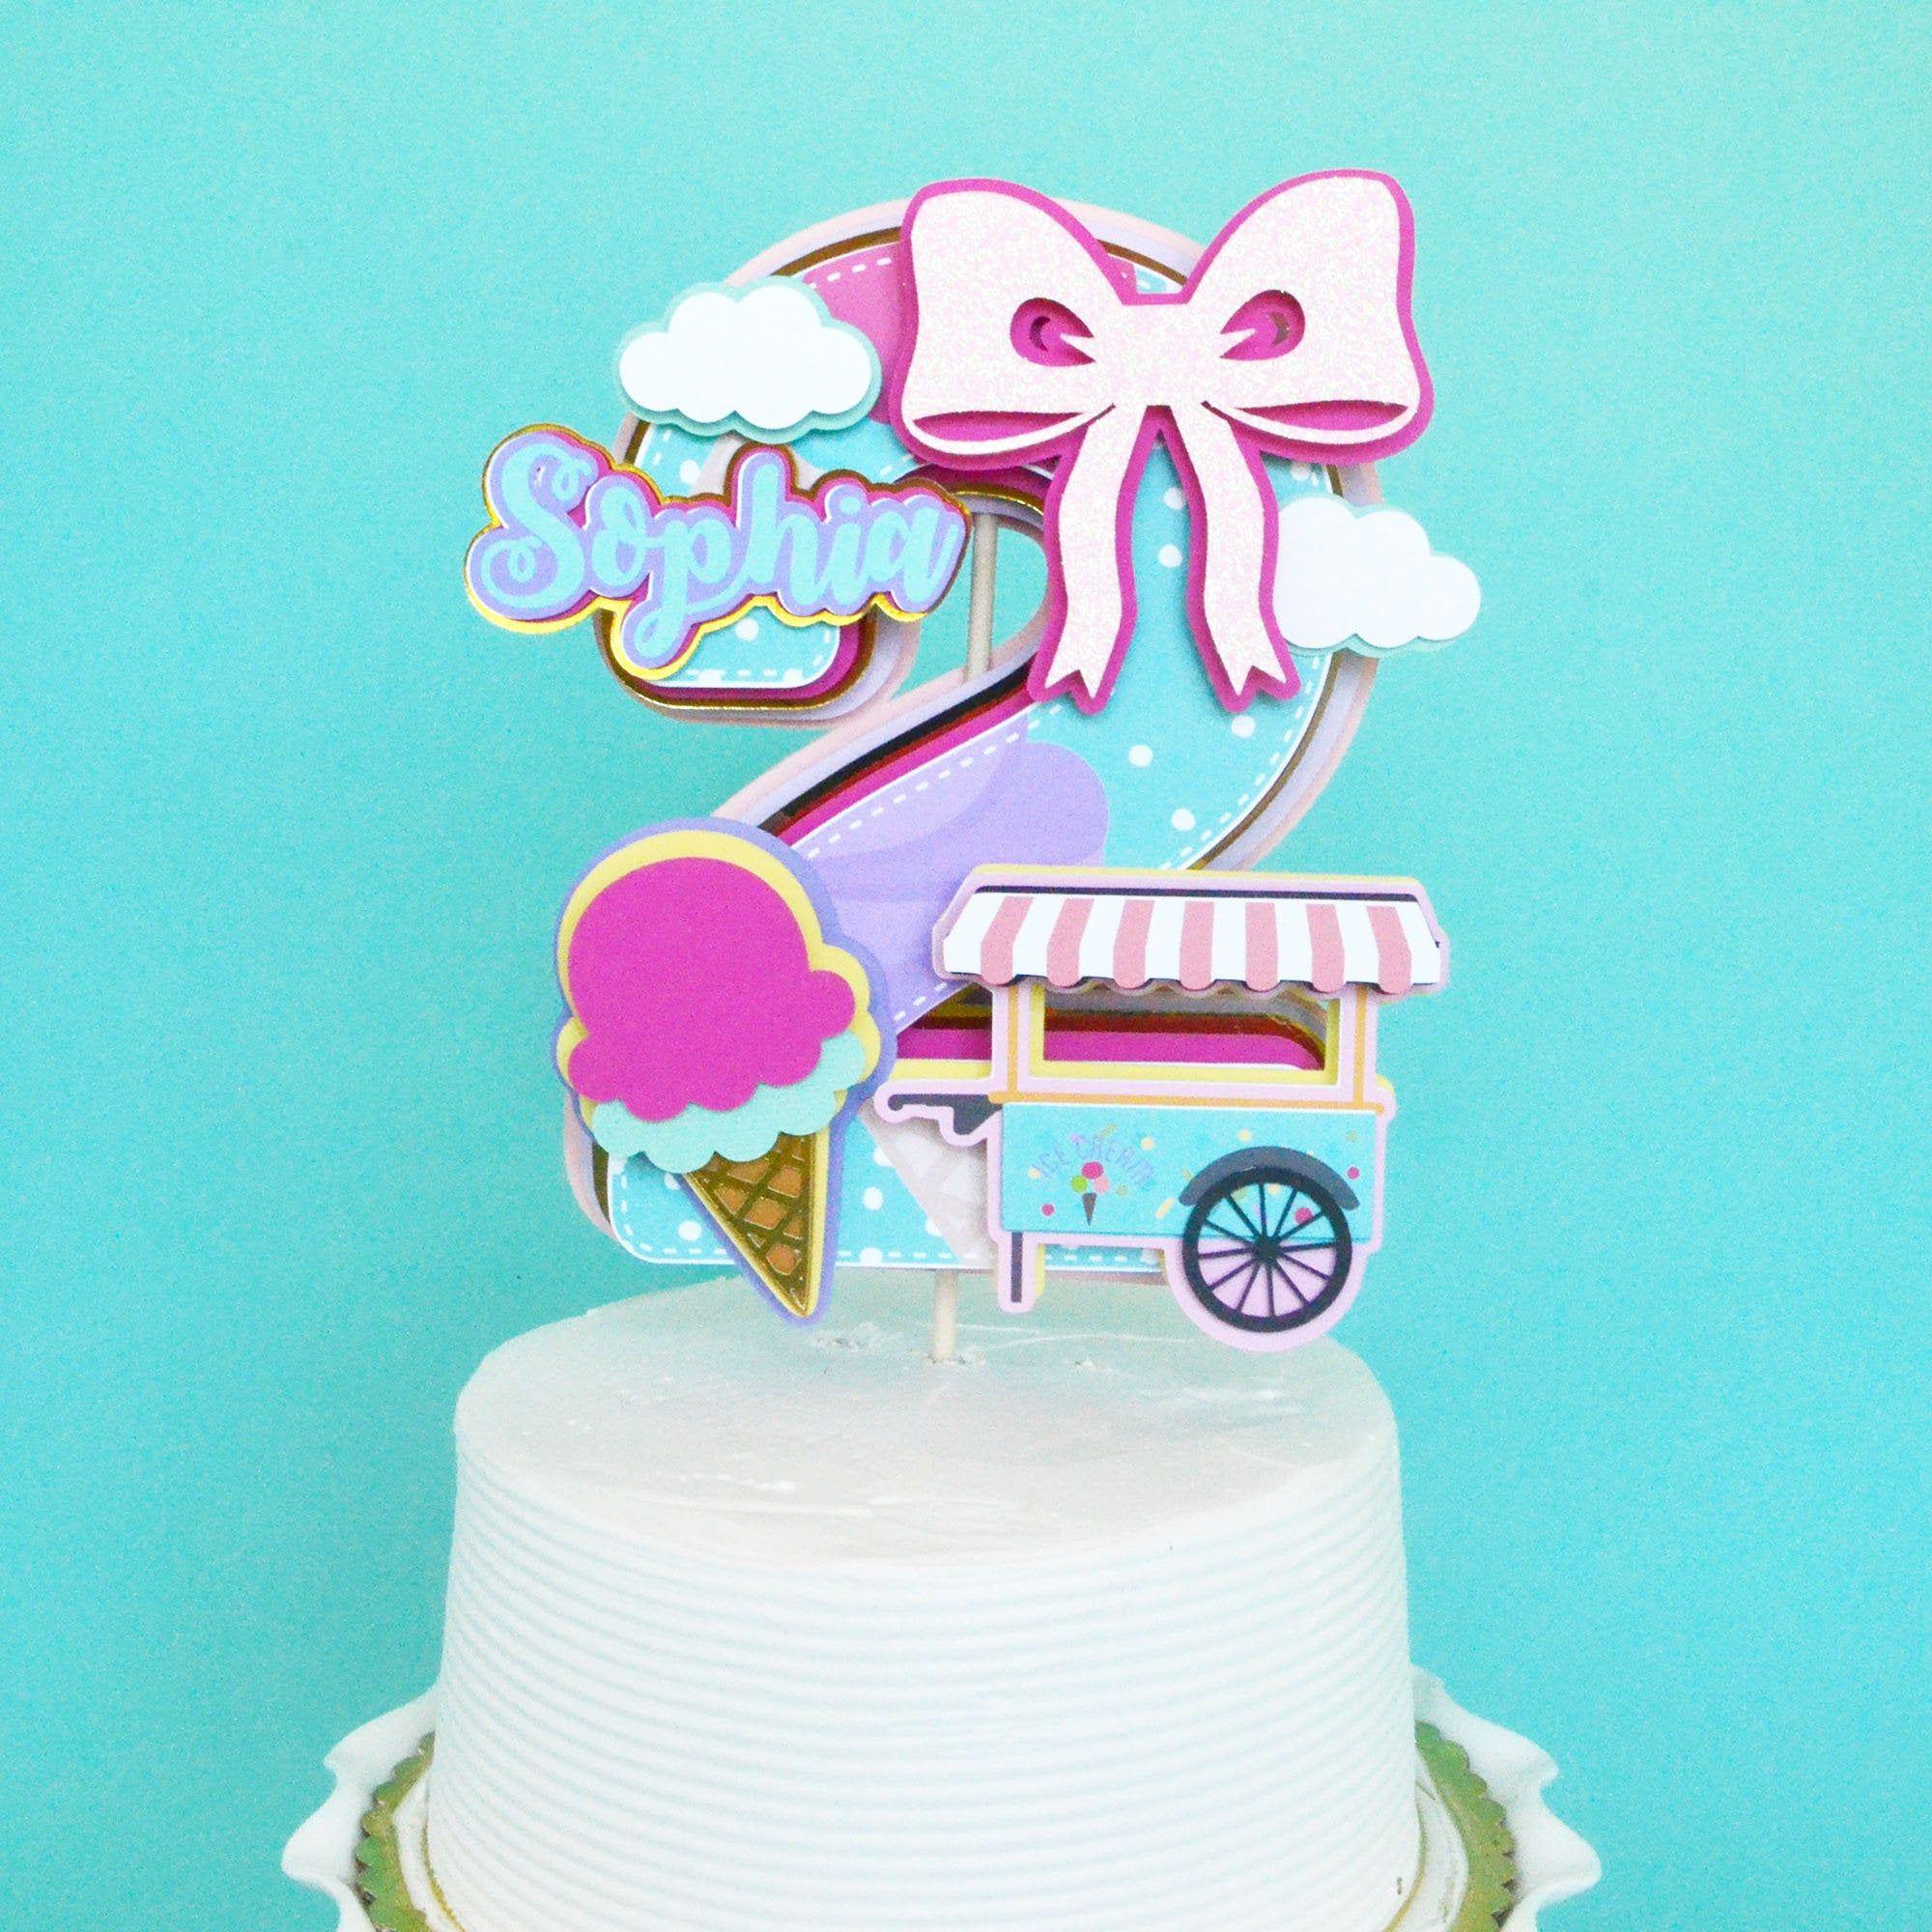 Second Birthday Cake Topper Ice Cream Cake Topper Ice Cream Party By Gabyrobbinsdesigns On Etsy Birthday Cake Toppers Second Birthday Cakes Cake